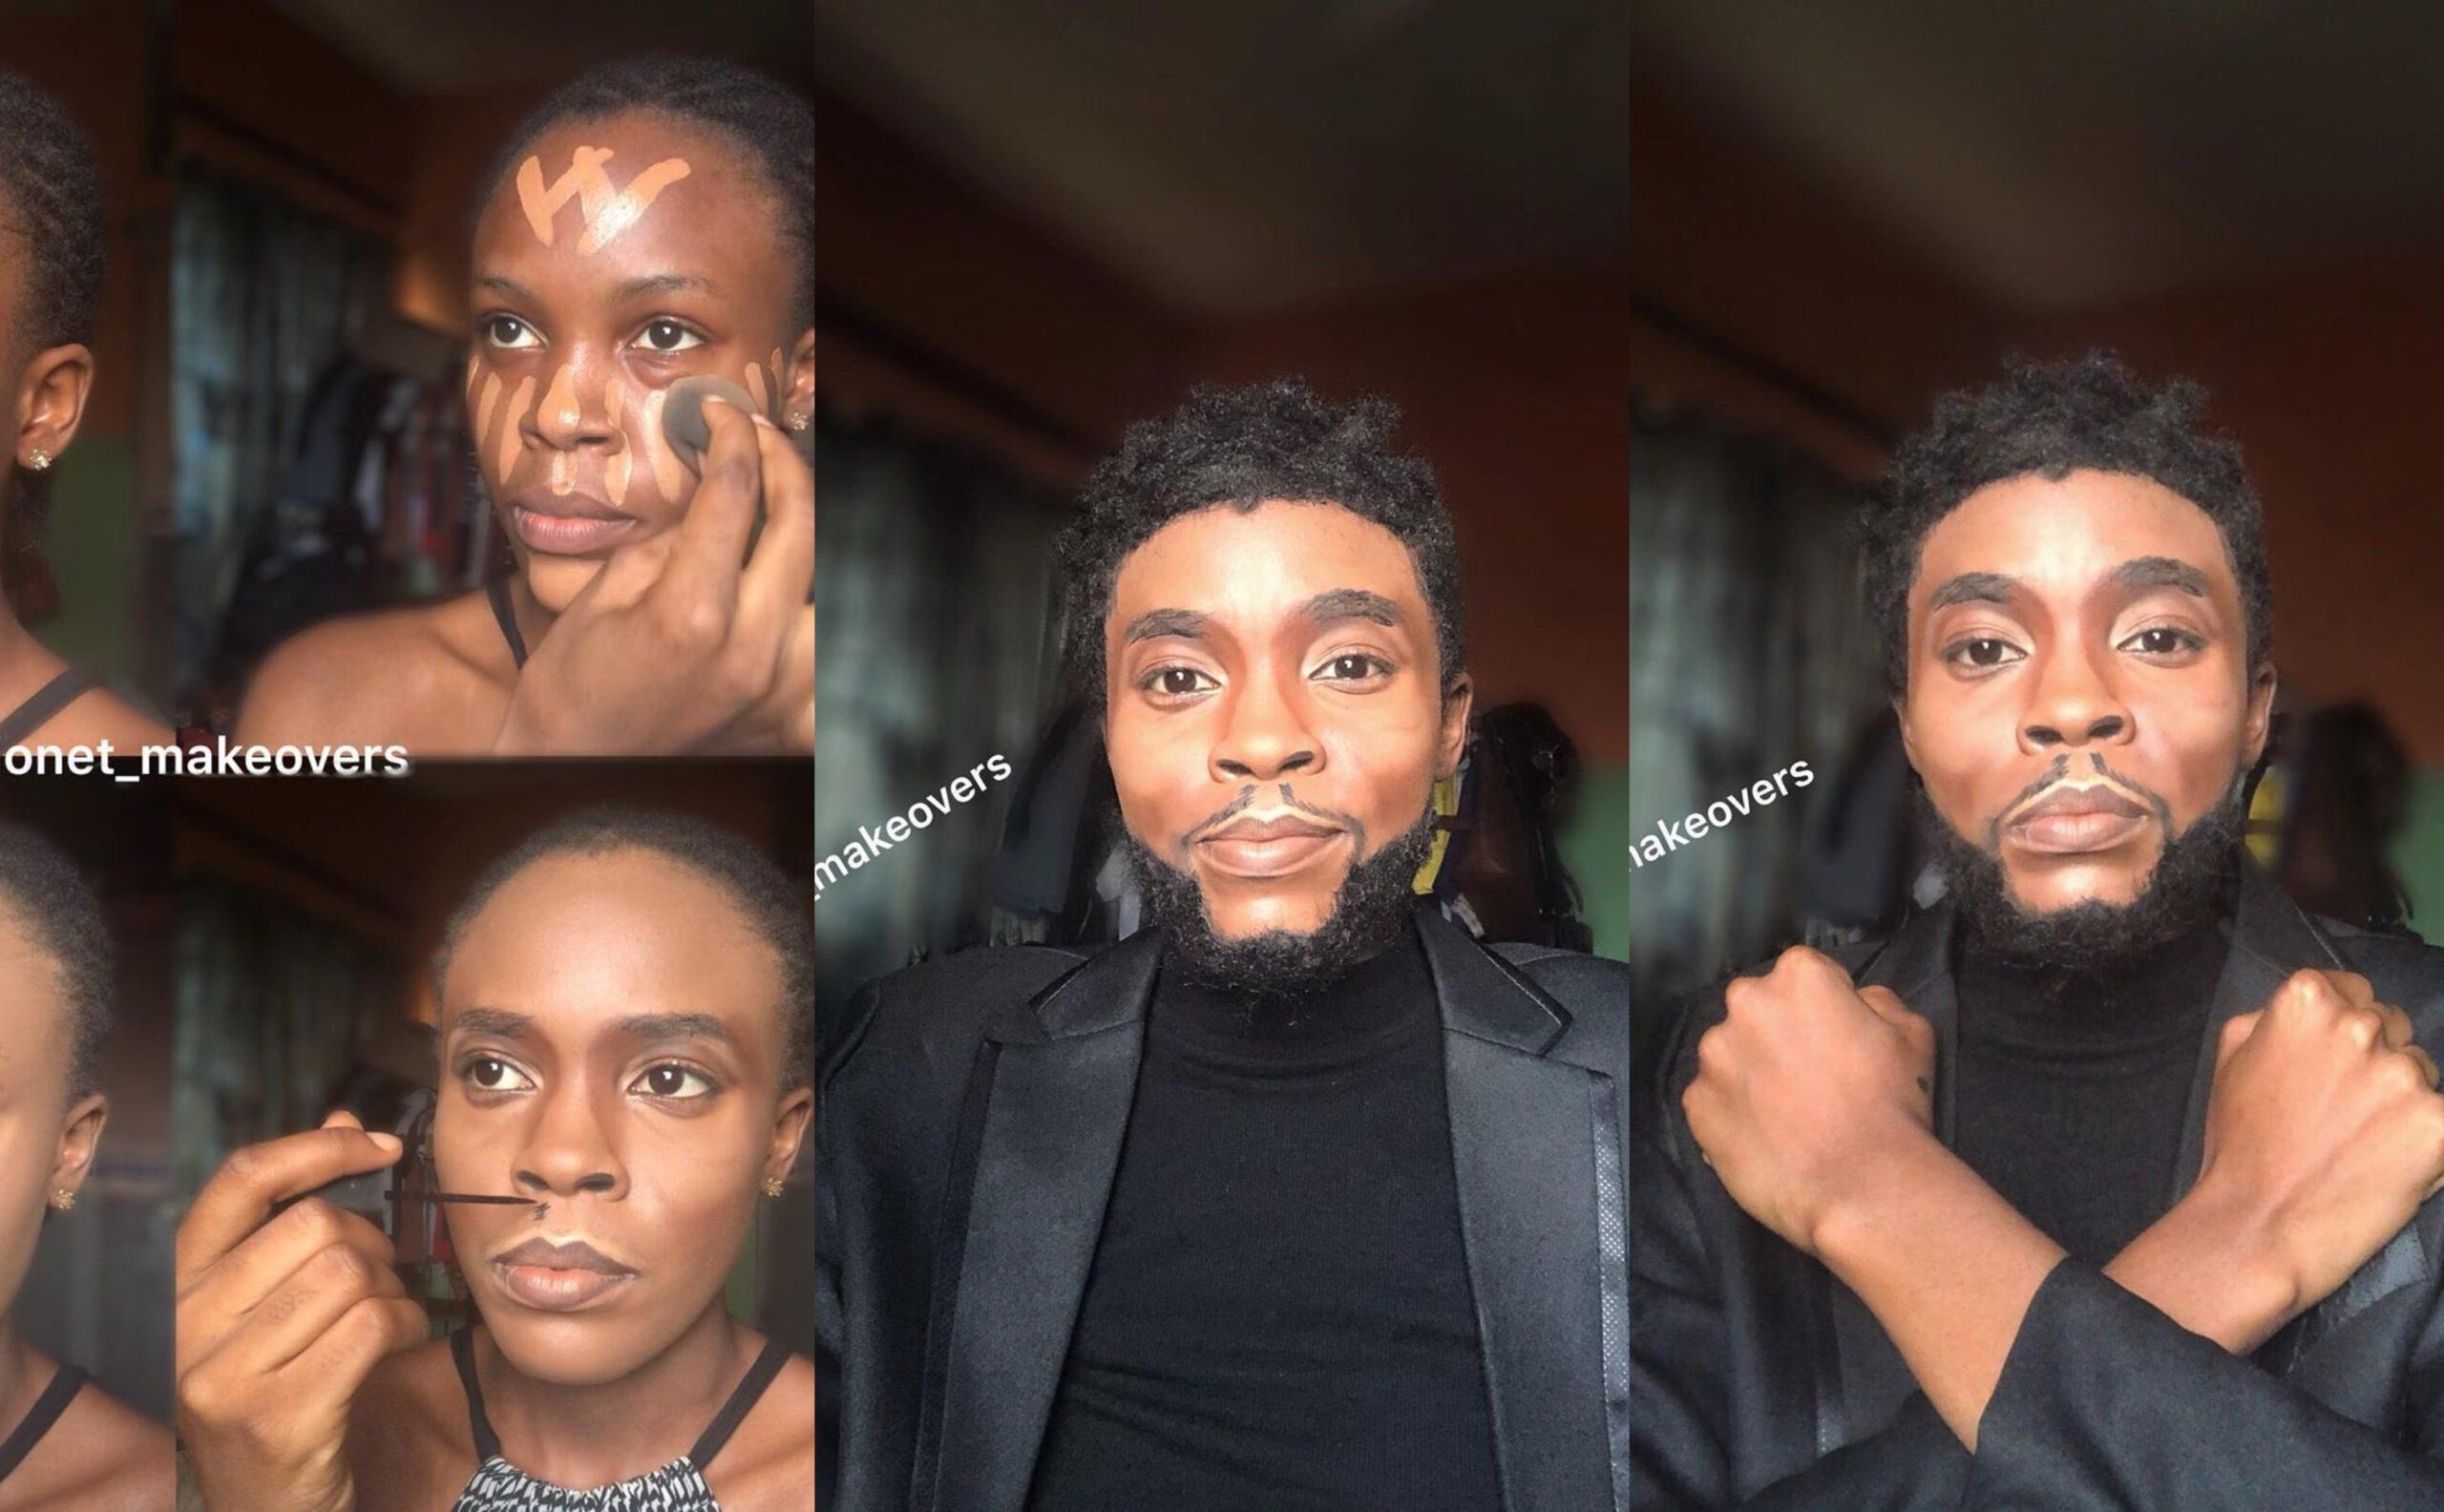 Nigerian make up artist stuns in make-over transformation to late Chadwick Boseman